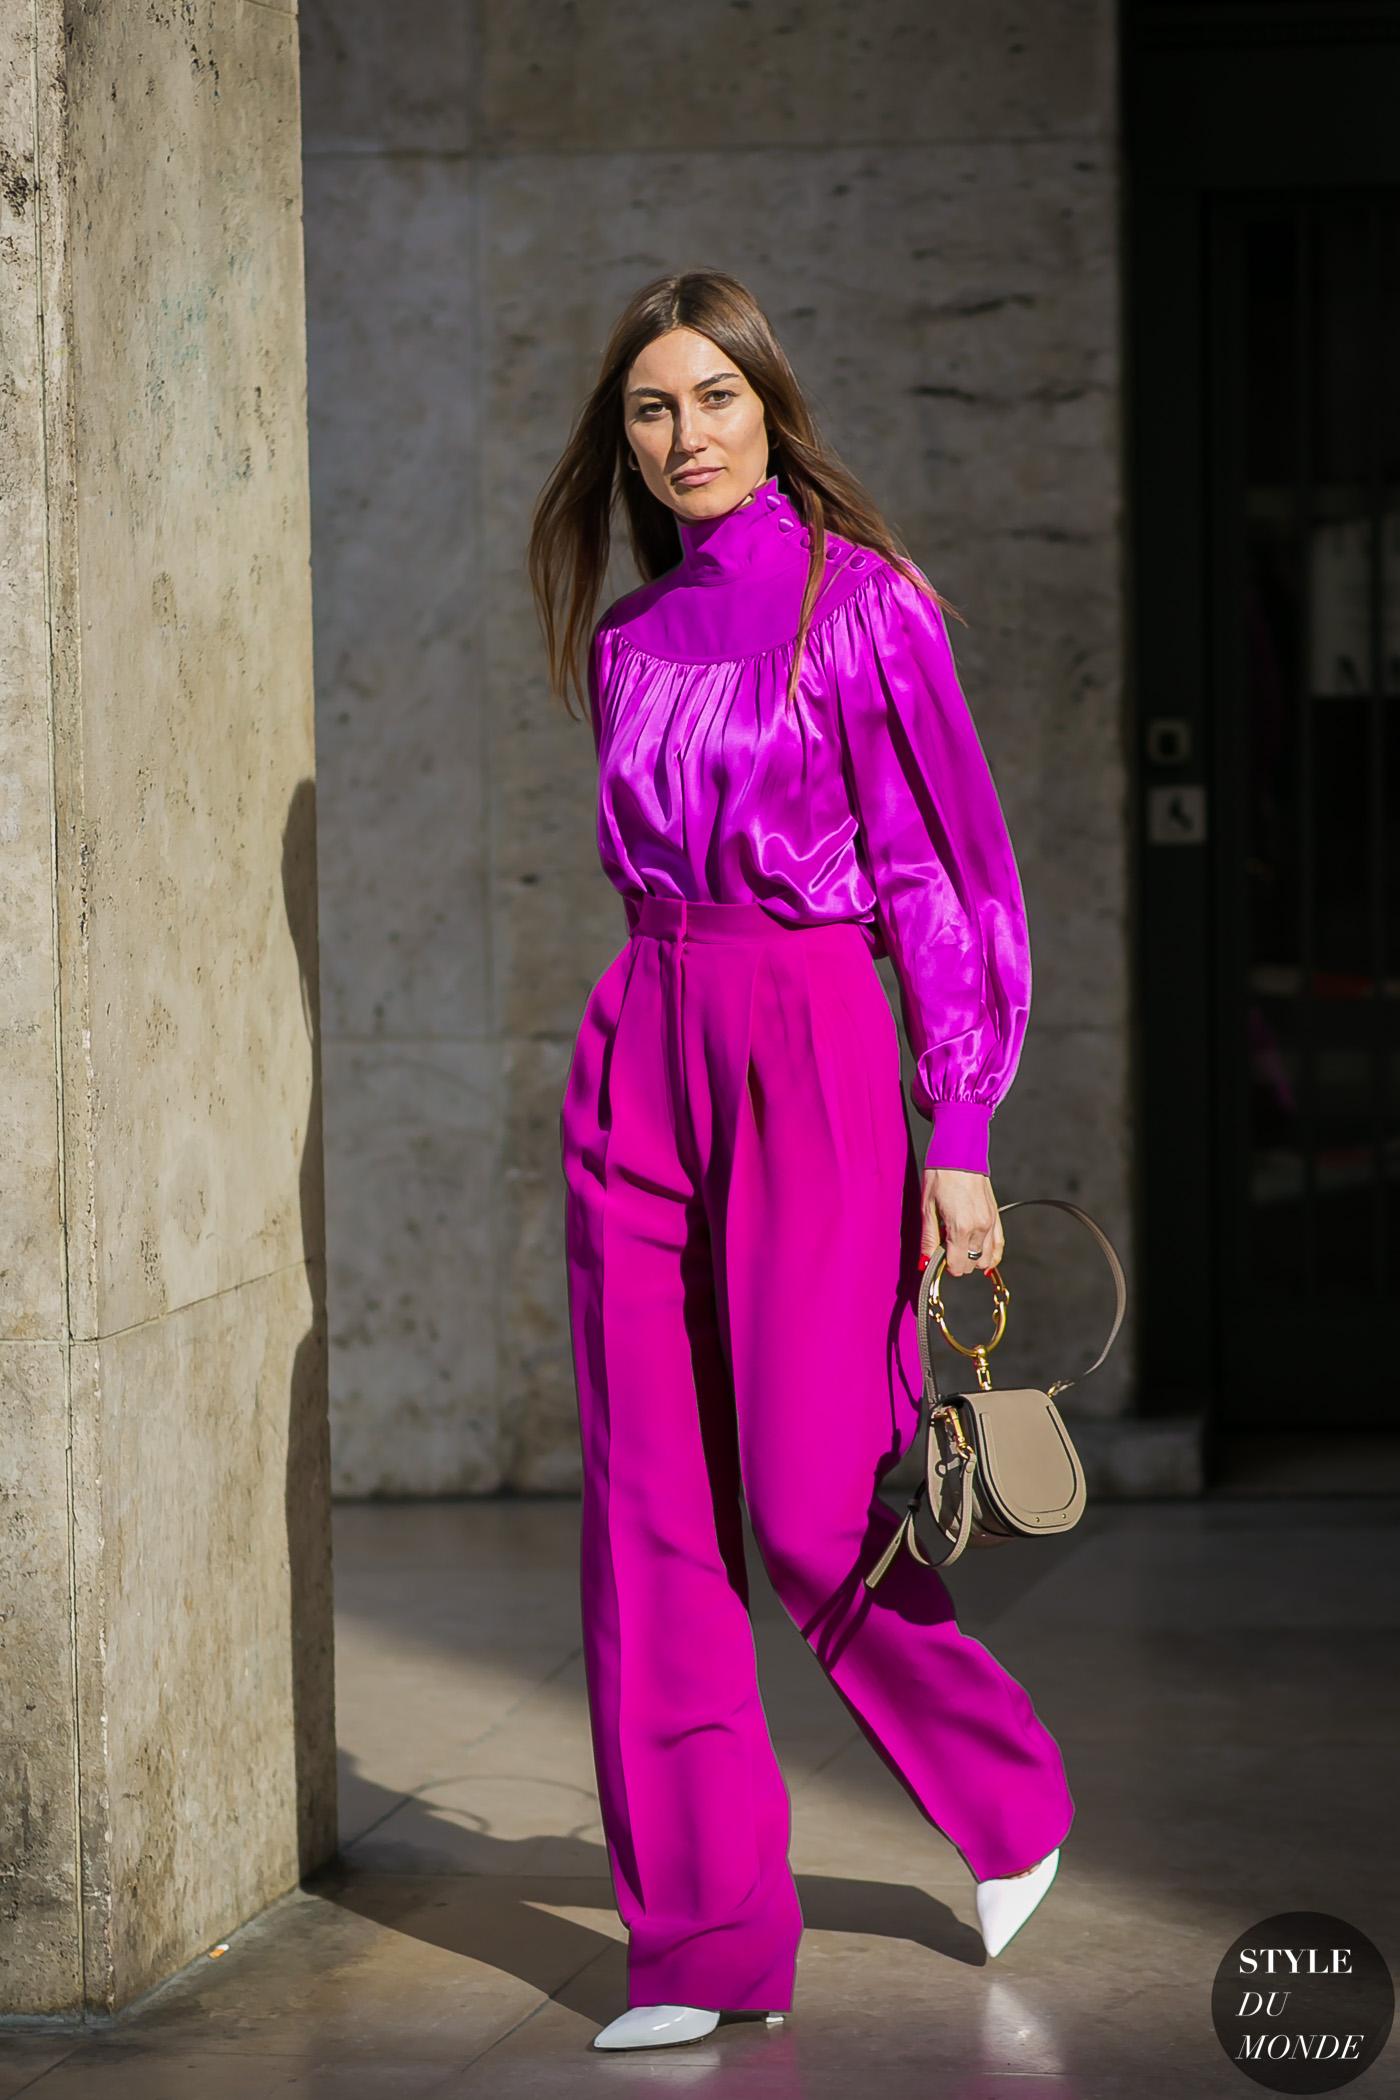 Giorgia-Tordini-by-STYLEDUMONDE-Street-Style-Fashion-Photography0E2A2307-700x1050@2x.jpg